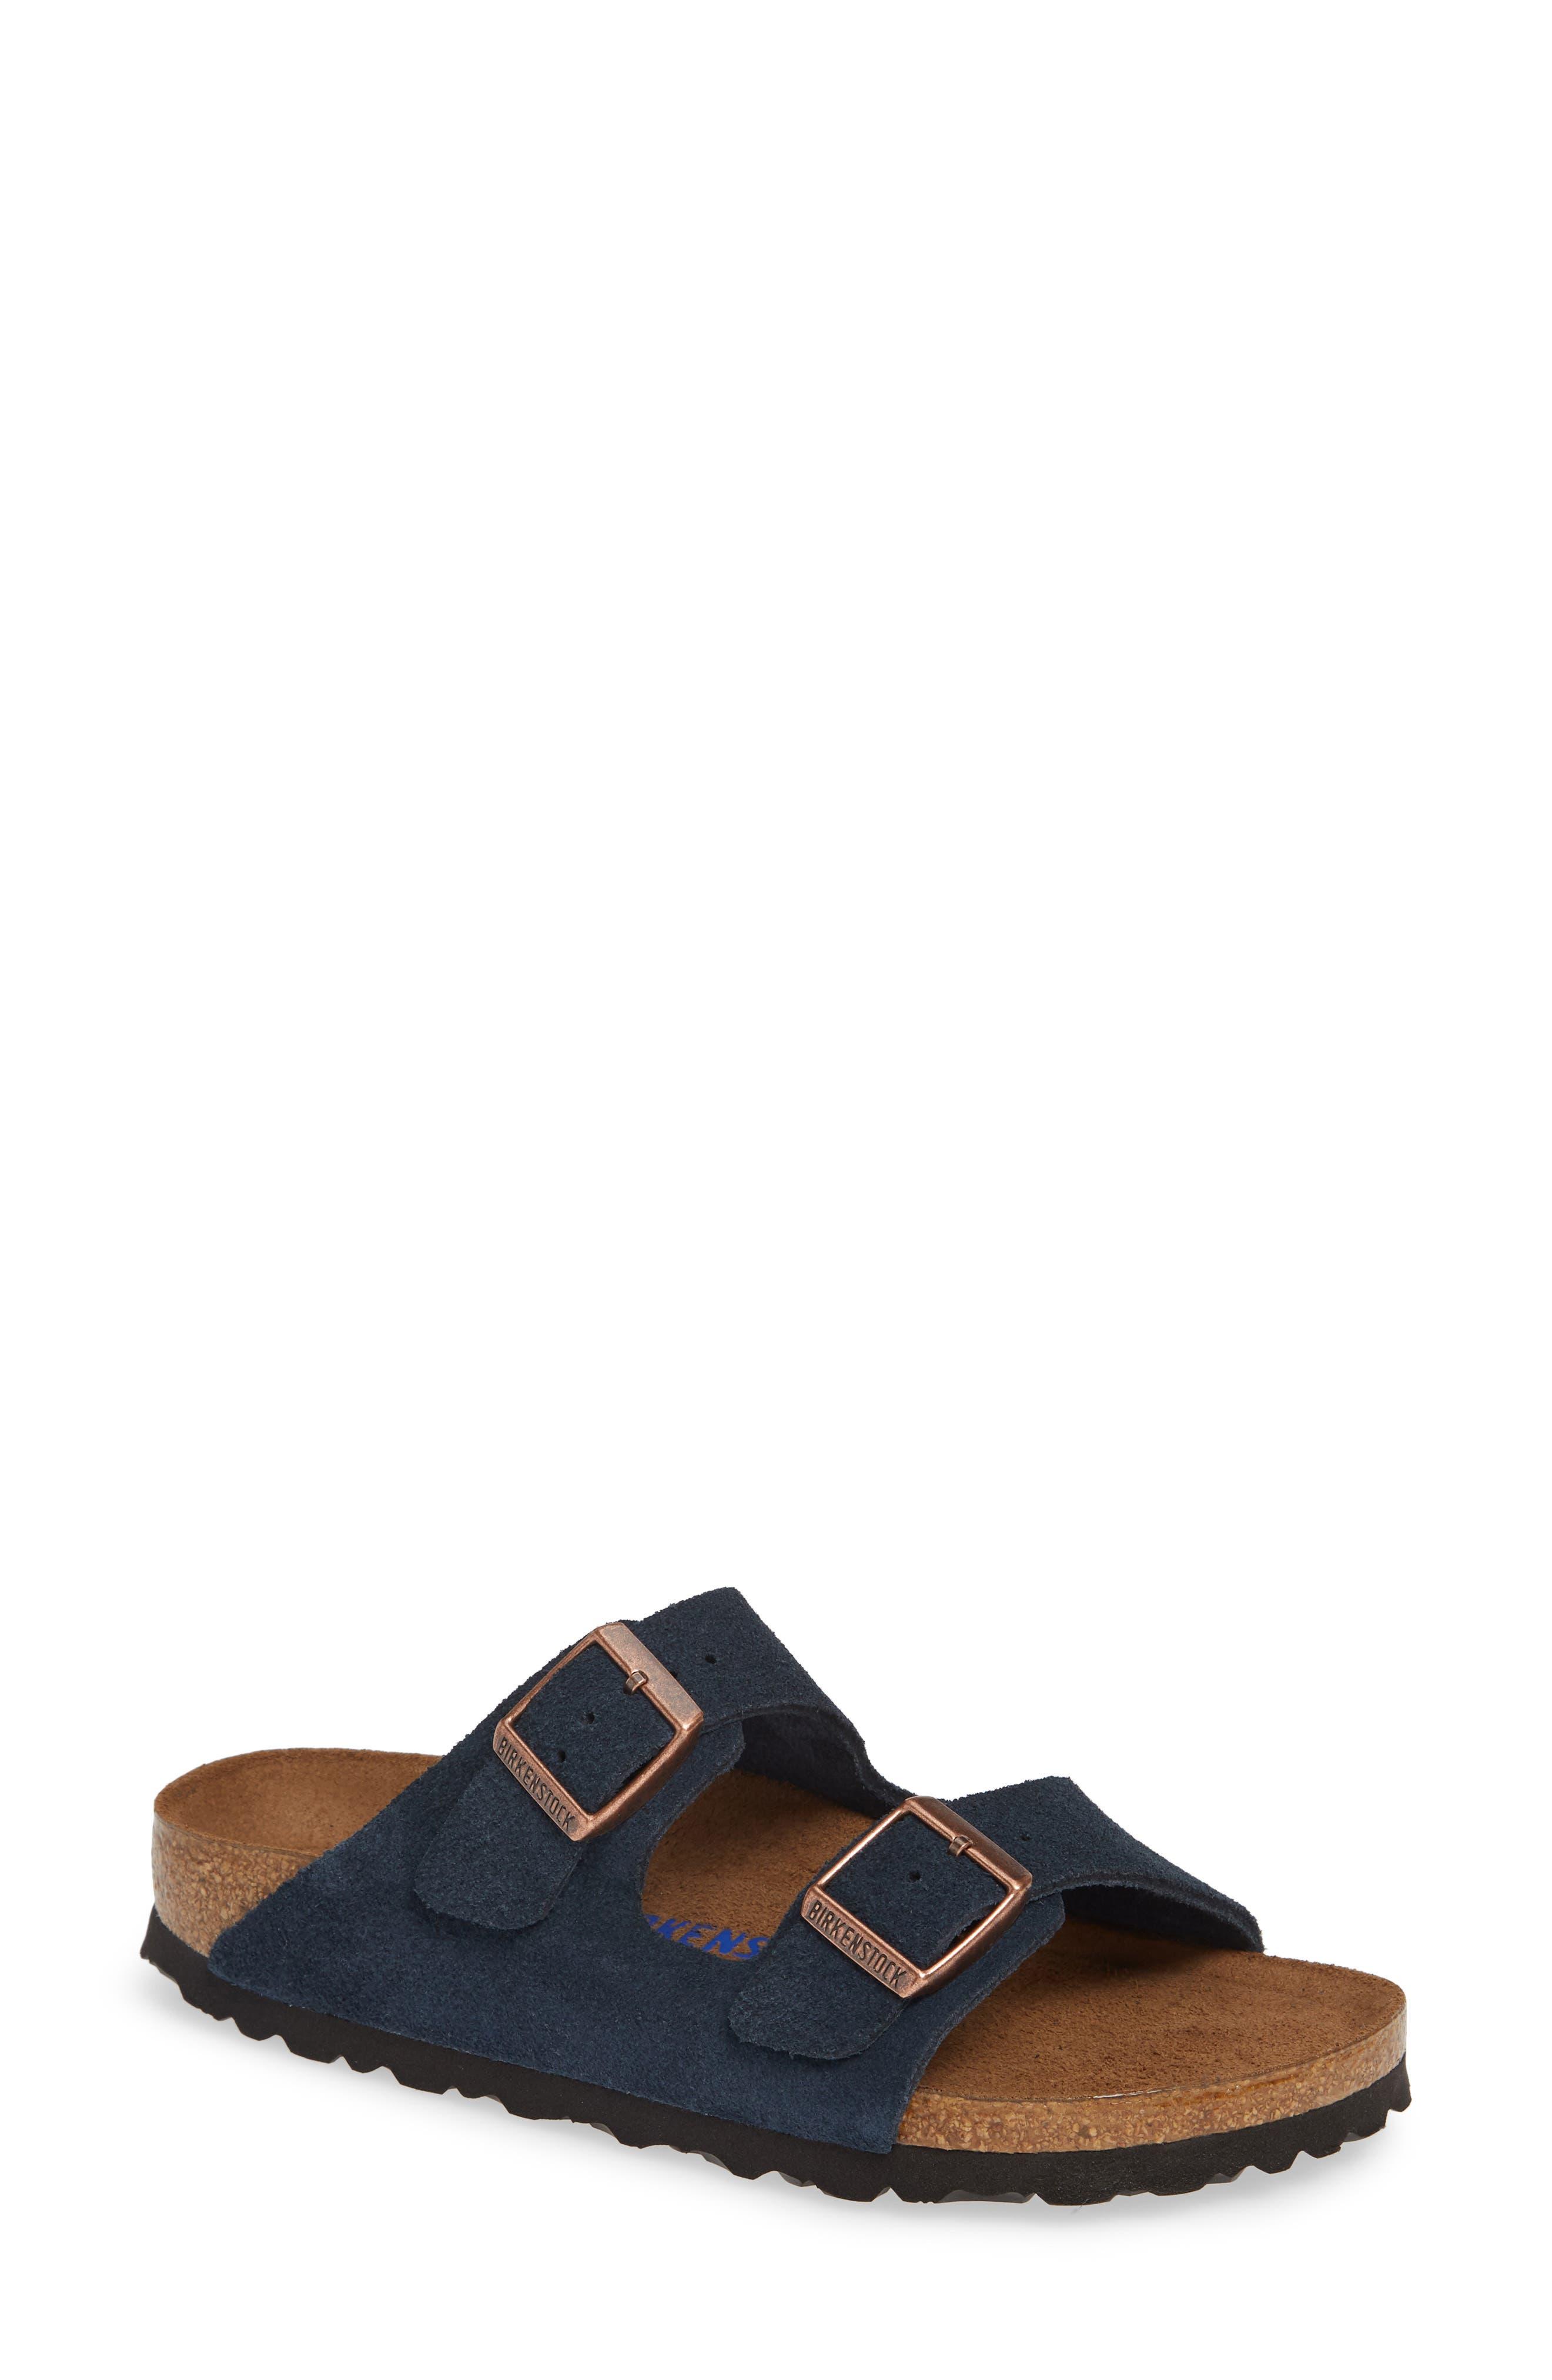 'Arizona' Soft Footbed Suede Sandal,                         Main,                         color, Navy